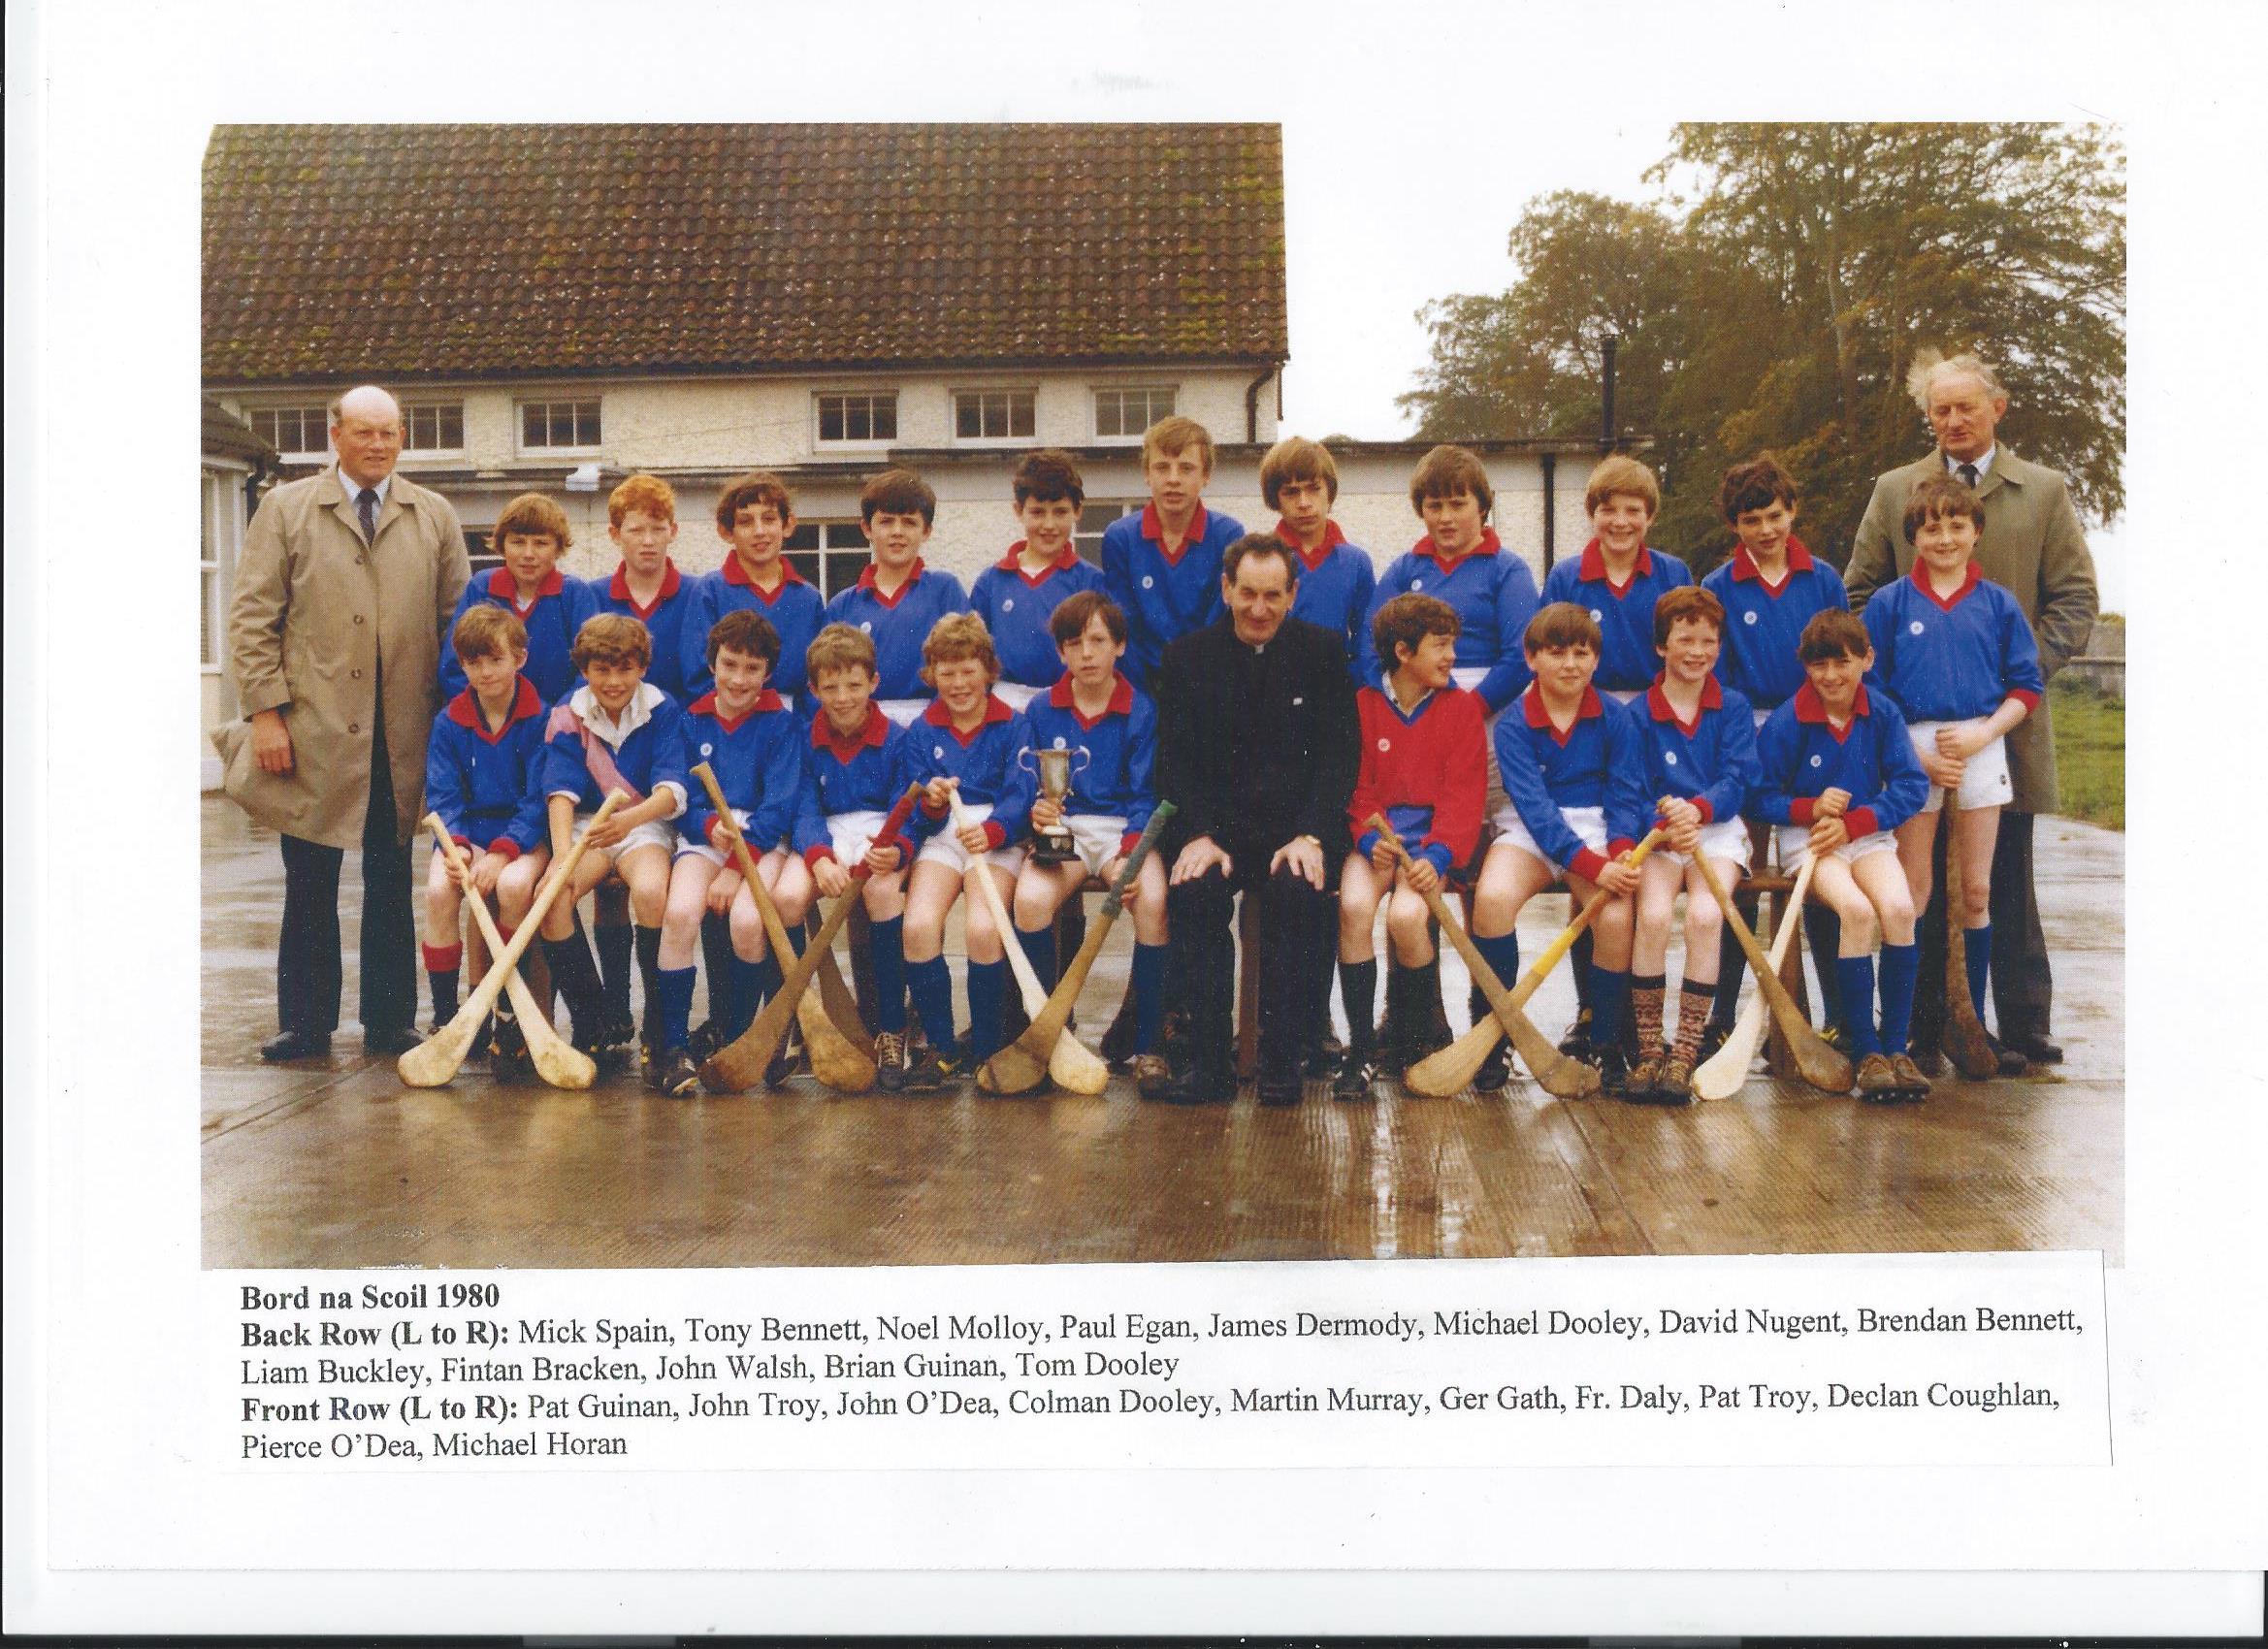 Bord Na Scoil Team - 1980